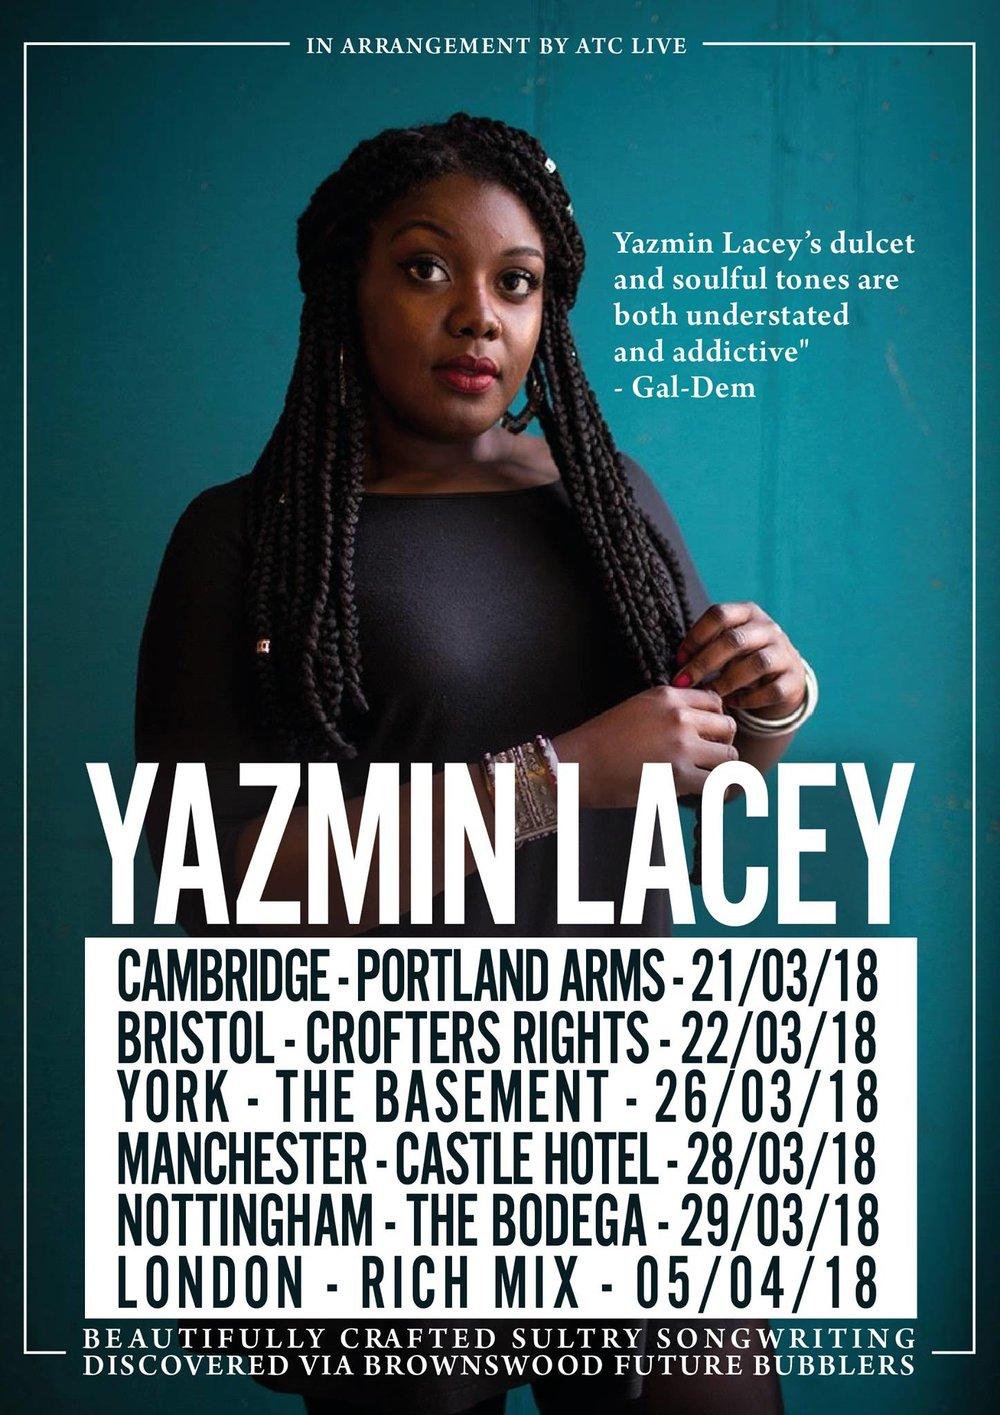 Yazmin Lacey Tour, Spring 2018